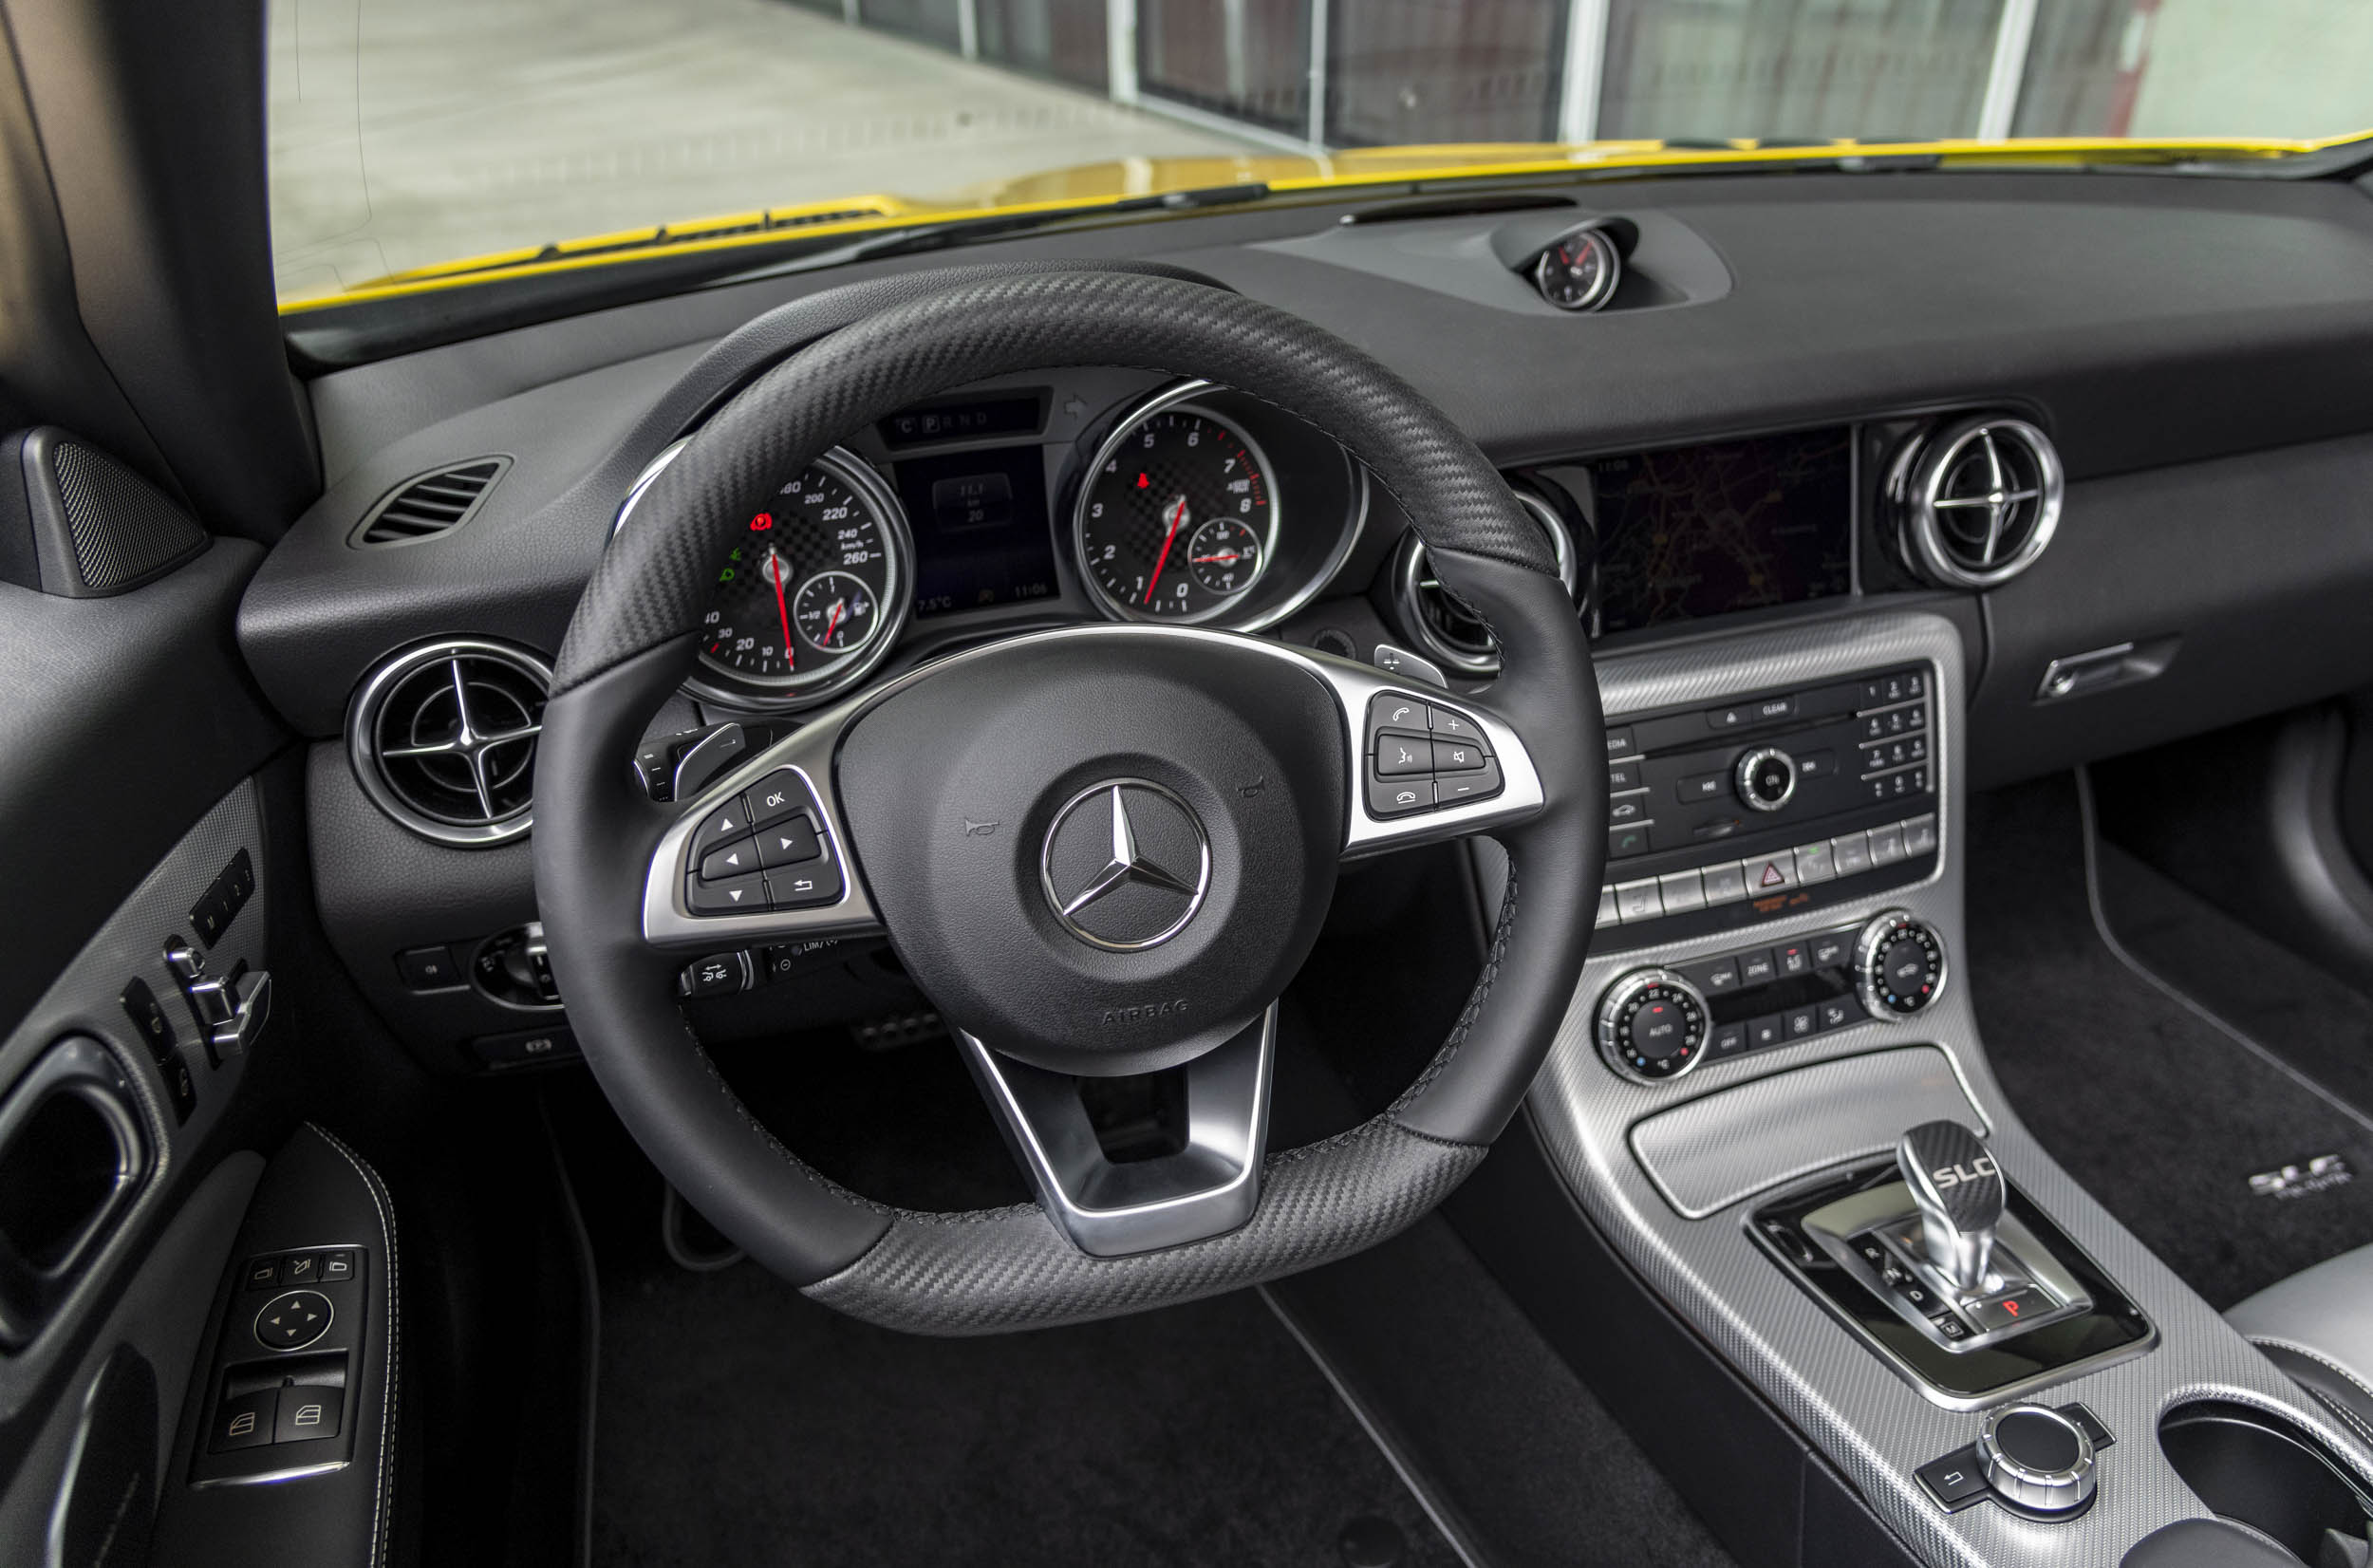 2020 Mercedes-Benz SLC Final Edition steering wheel